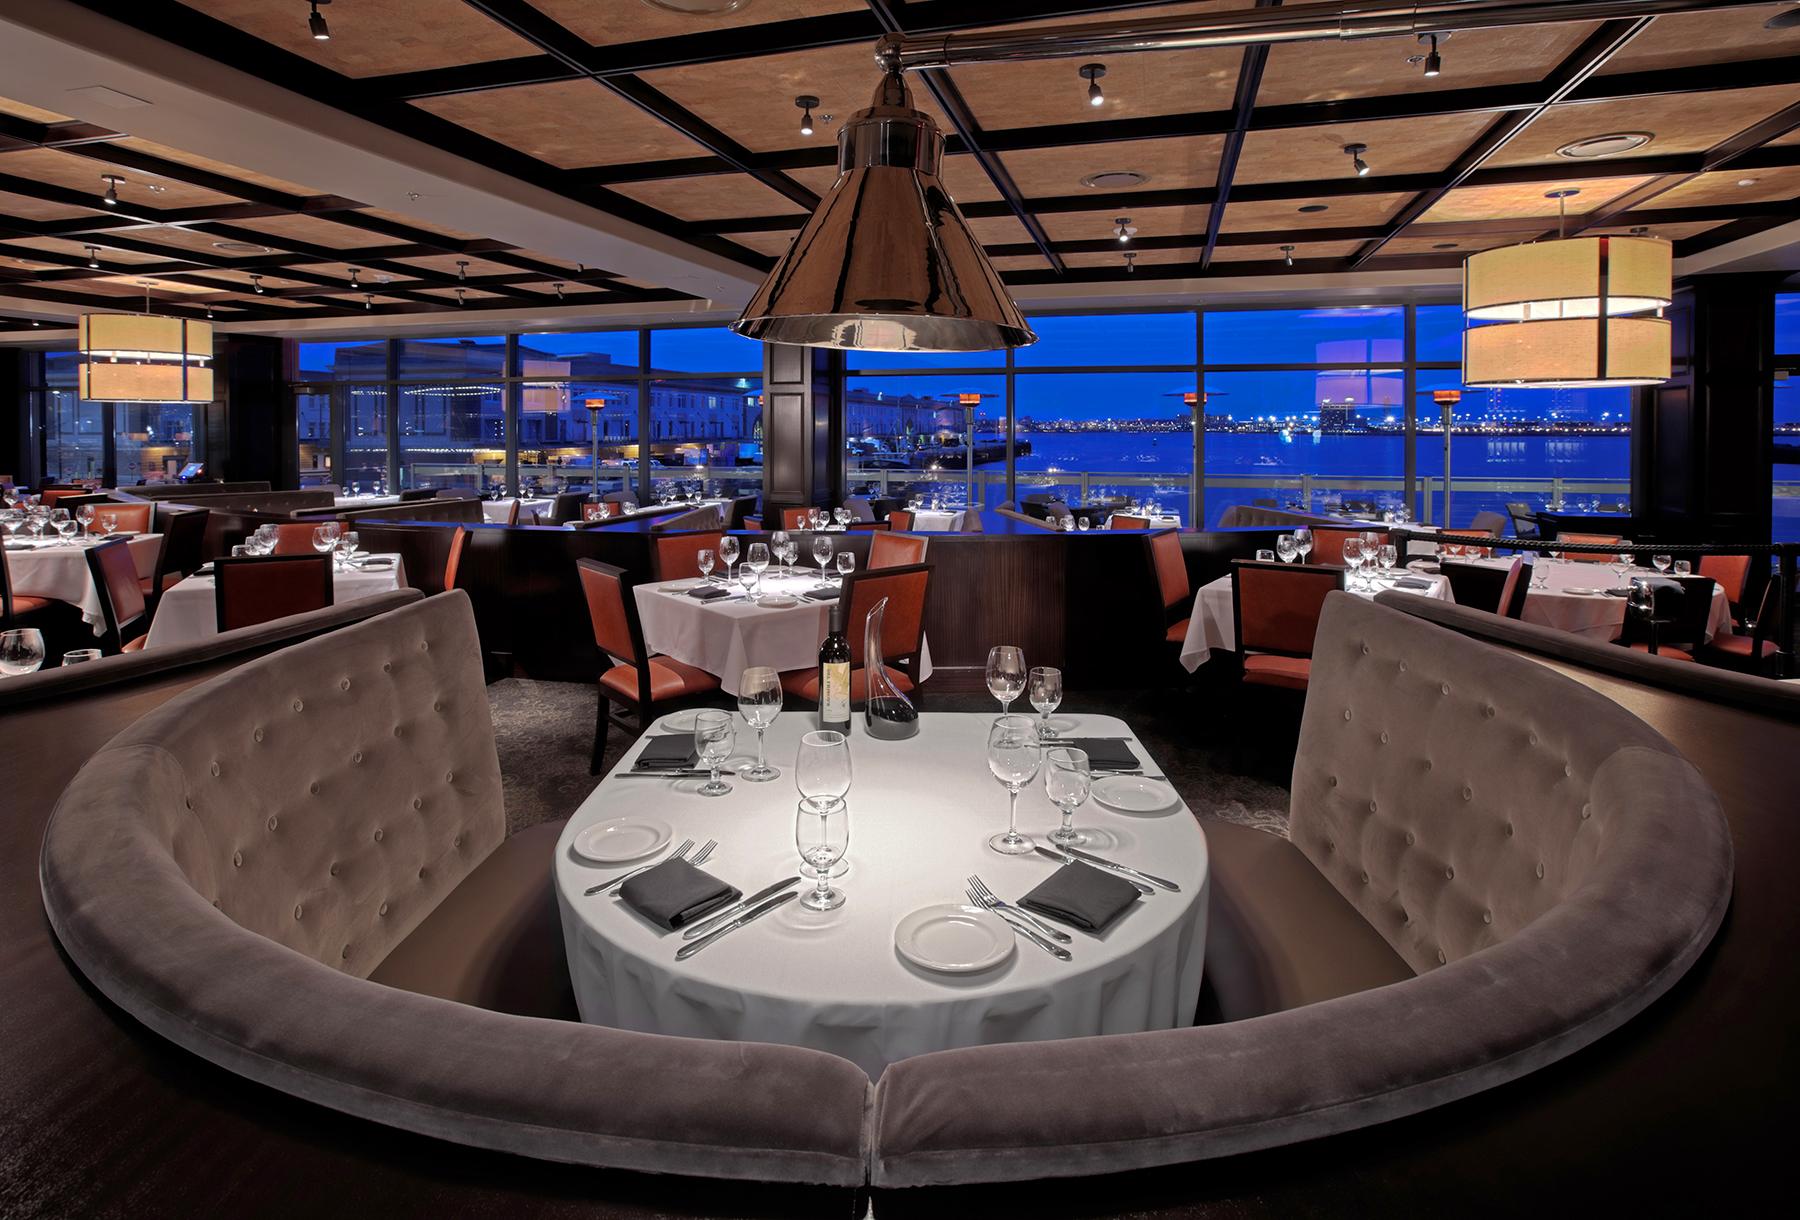 Dining_Room2_Master_HDR crop.jpg